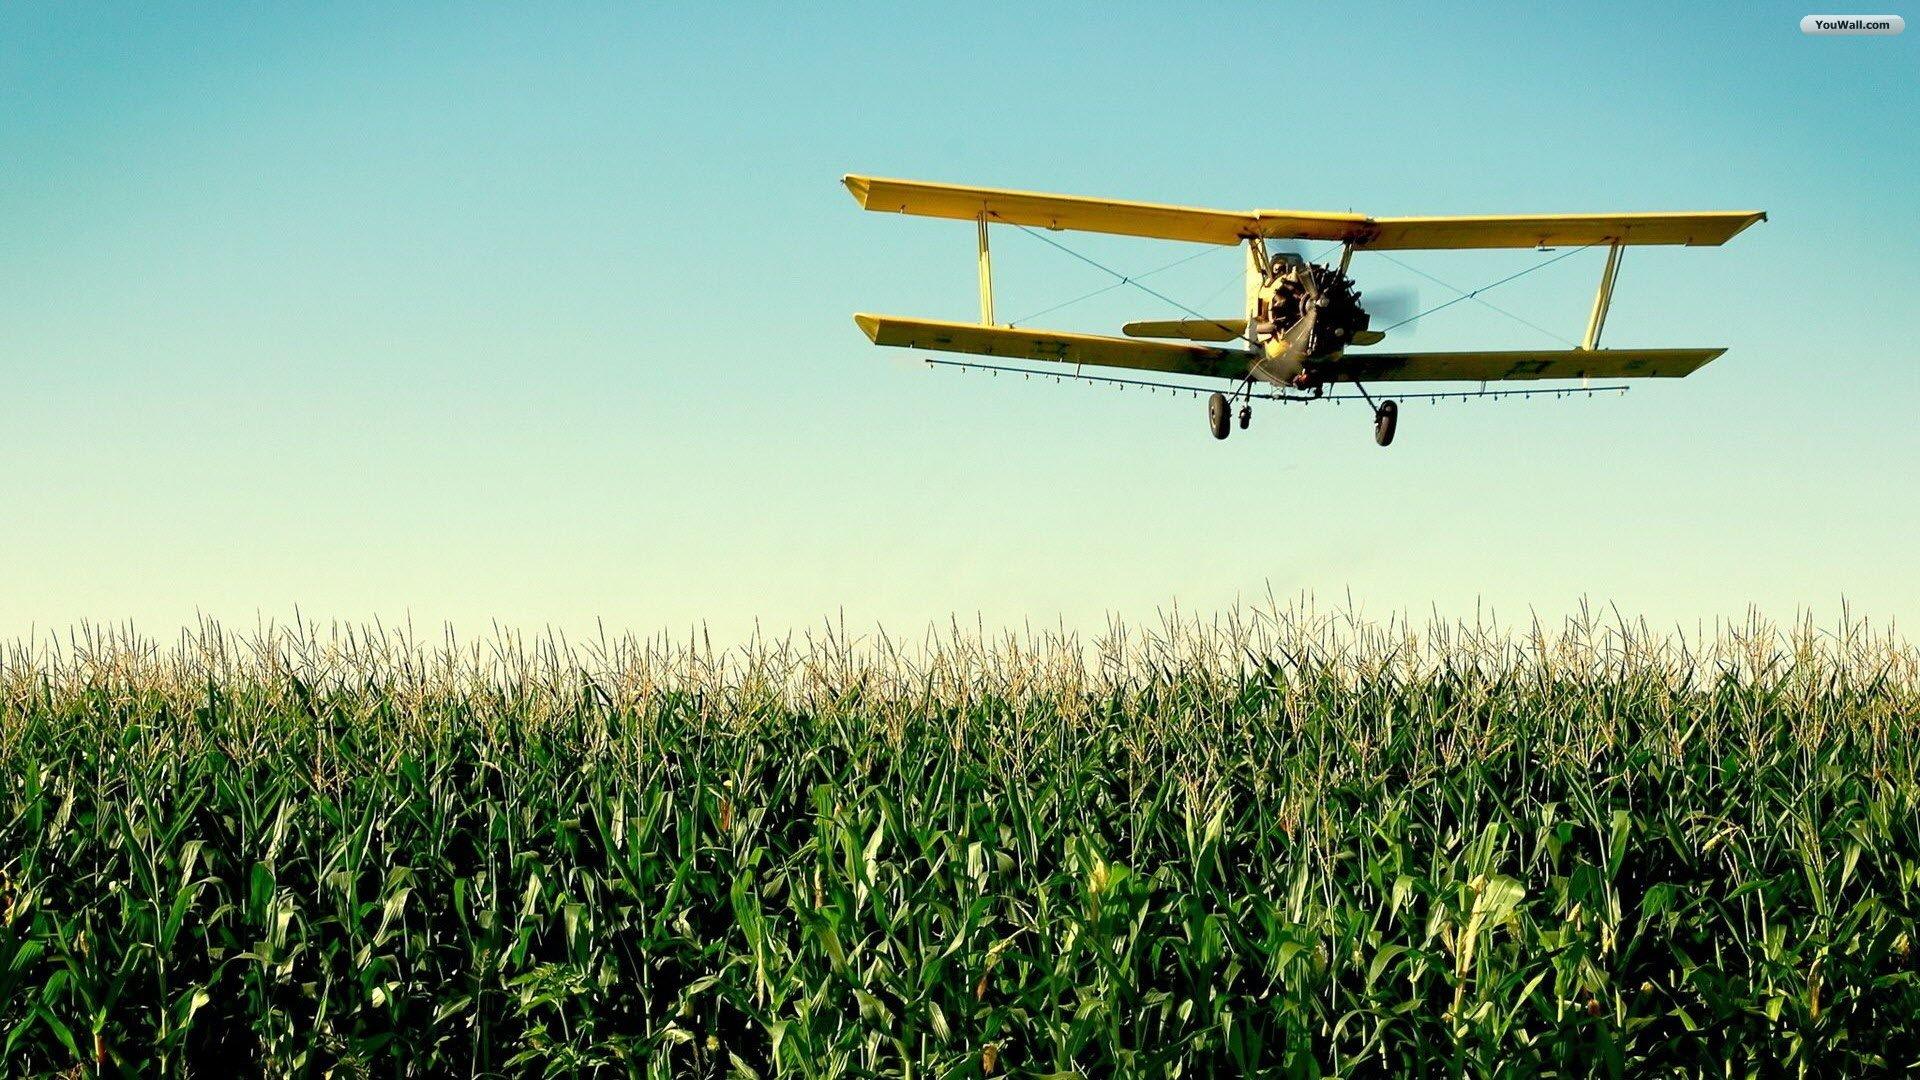 Airplane Wallpaper 16